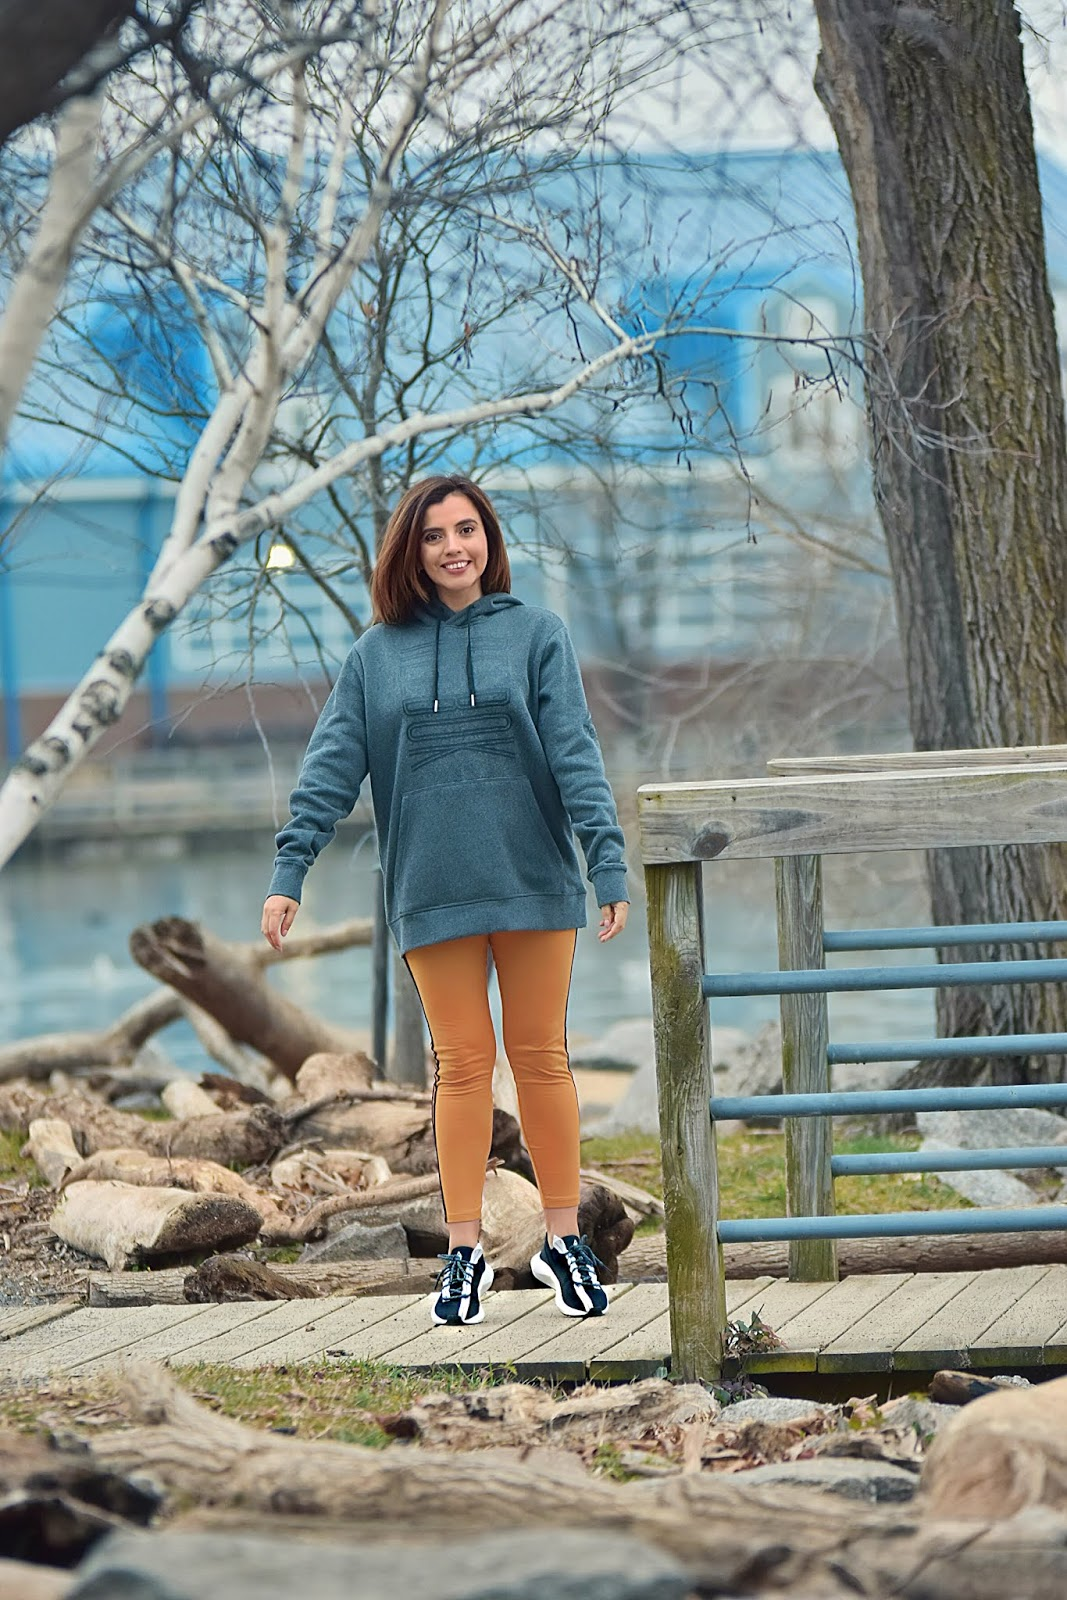 Reebok Sole Fury-splitfrom-MariEstilo-dcblogger-fashionblogger-streetstyle-reebok-